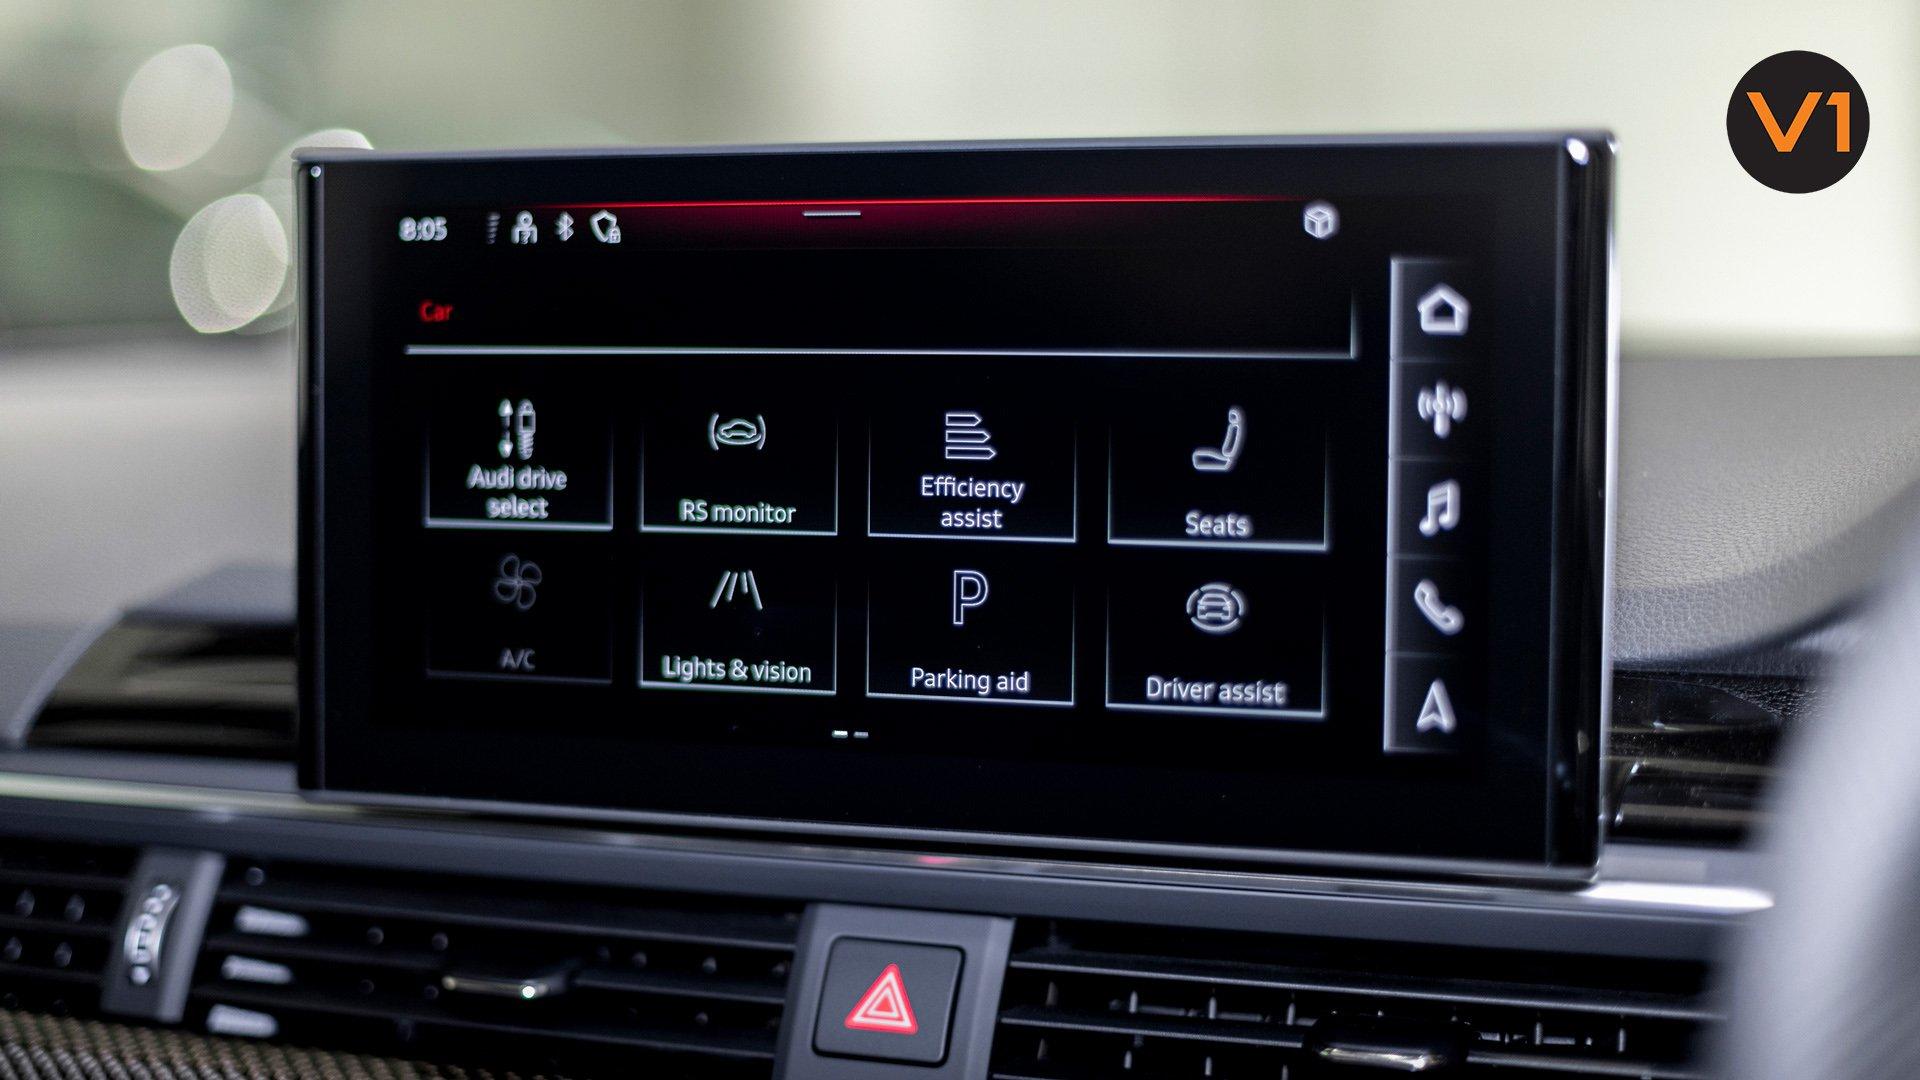 AUDI RS 4 AVANT - Media Display